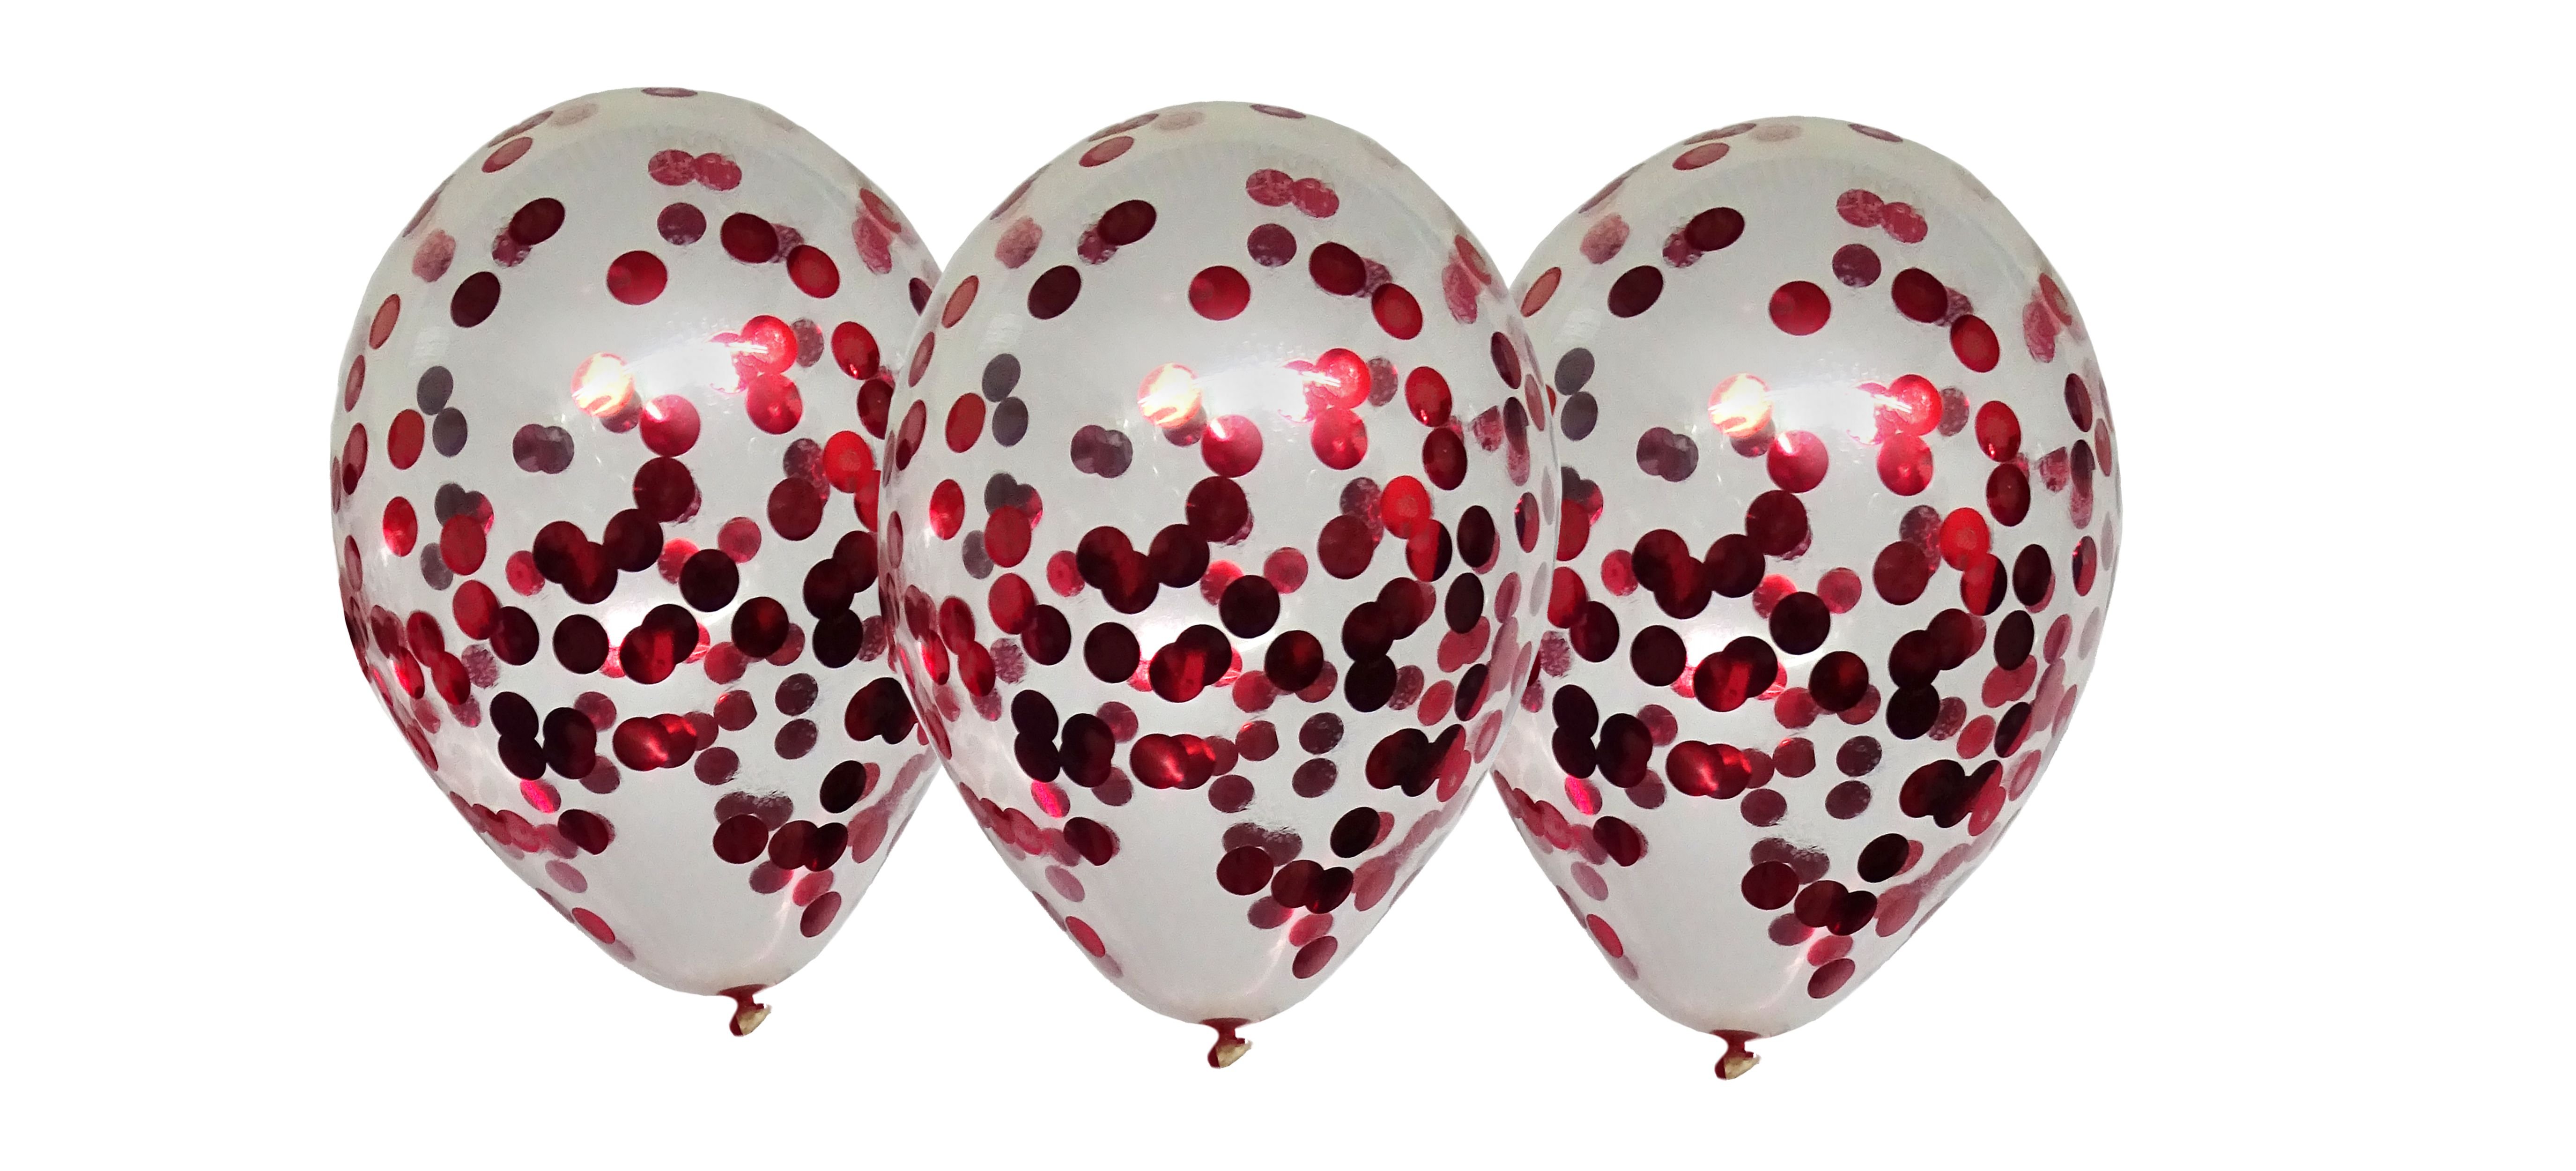 konfettiluftballons-rot